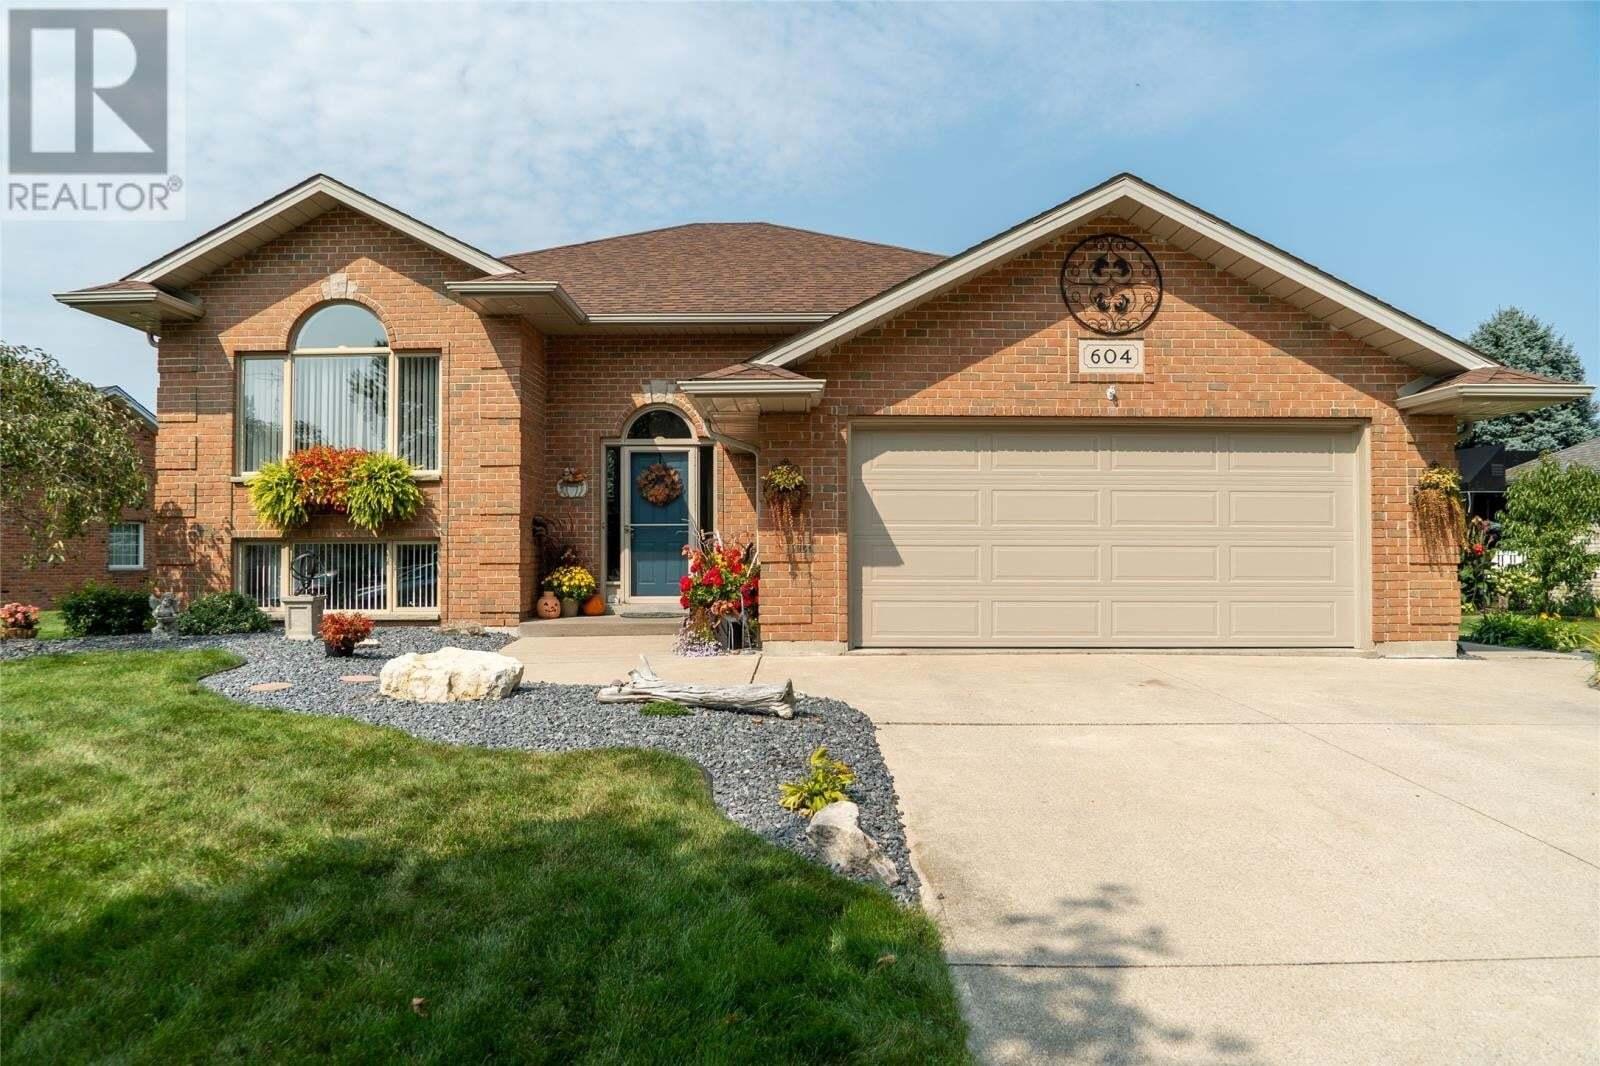 House for sale at 604 Bastien  Amherstburg Ontario - MLS: 20012551